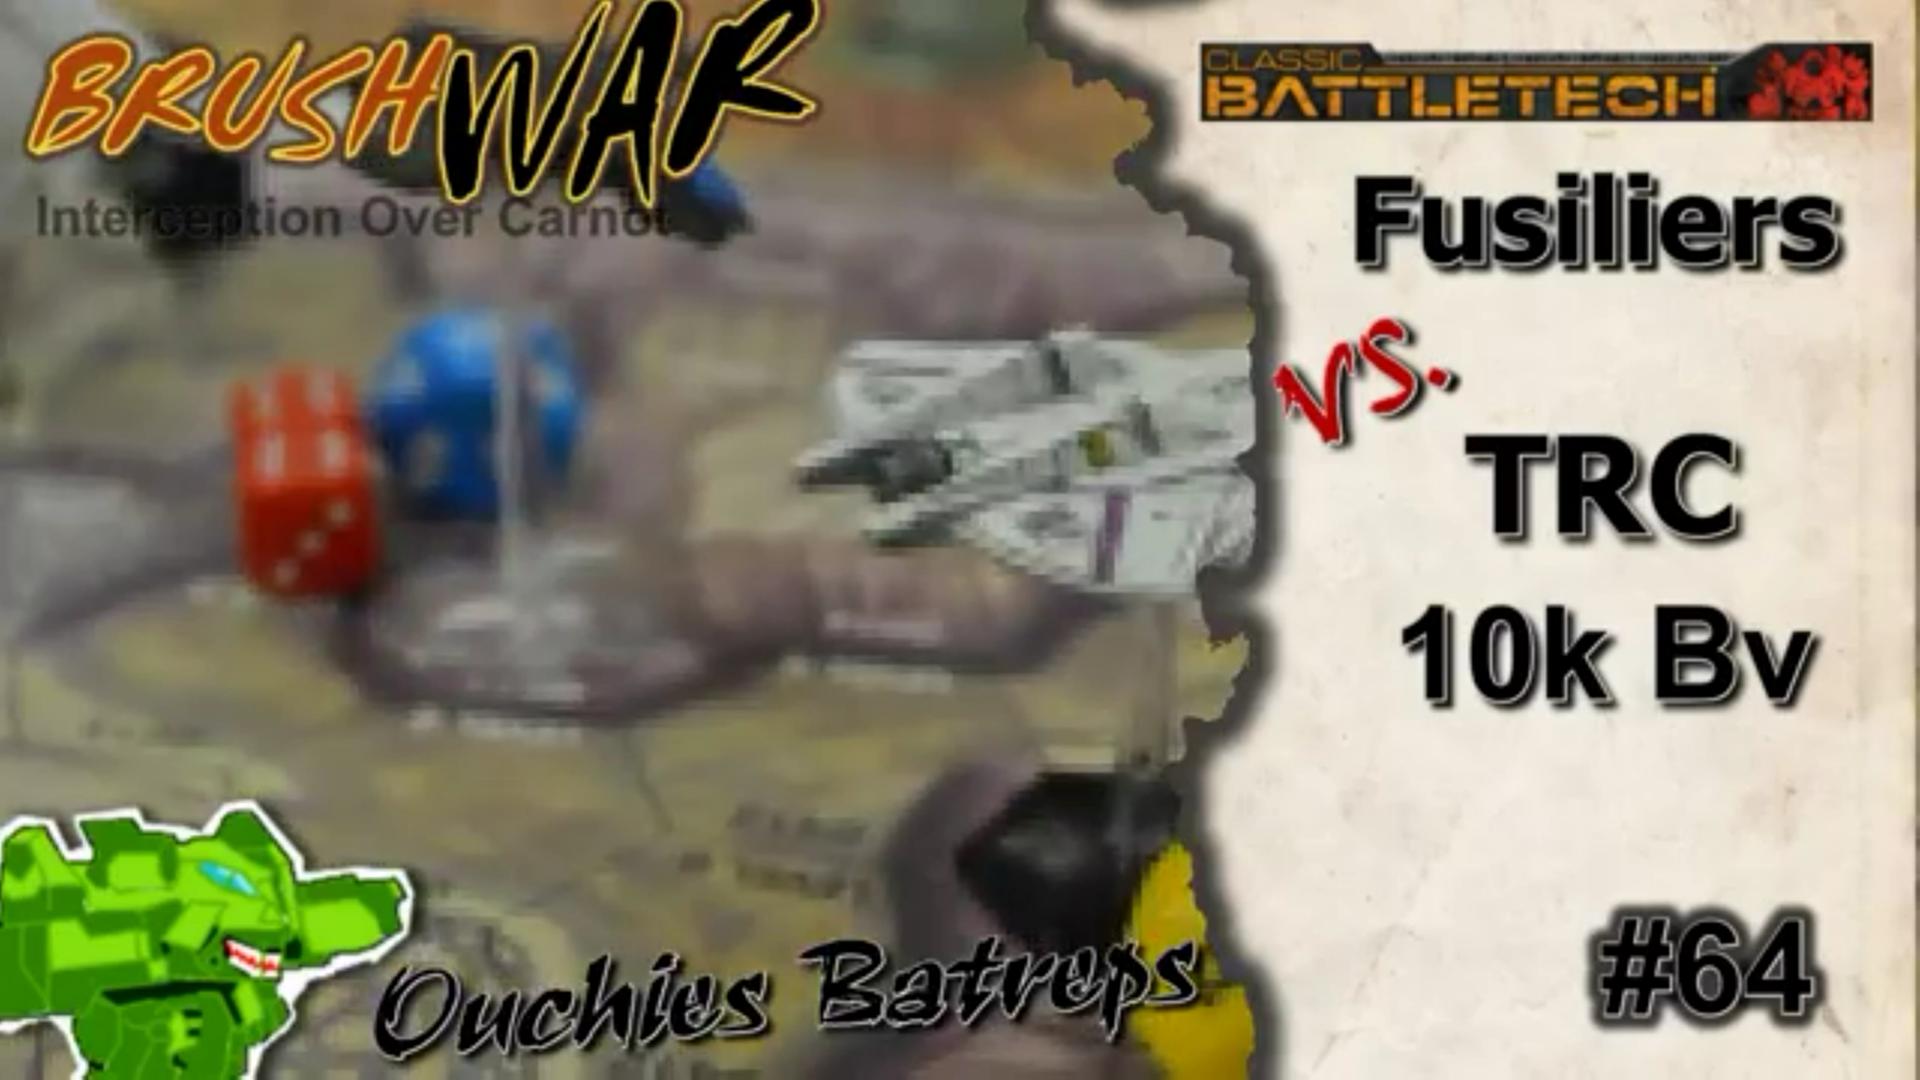 #64 Fusiliers vs. TRC